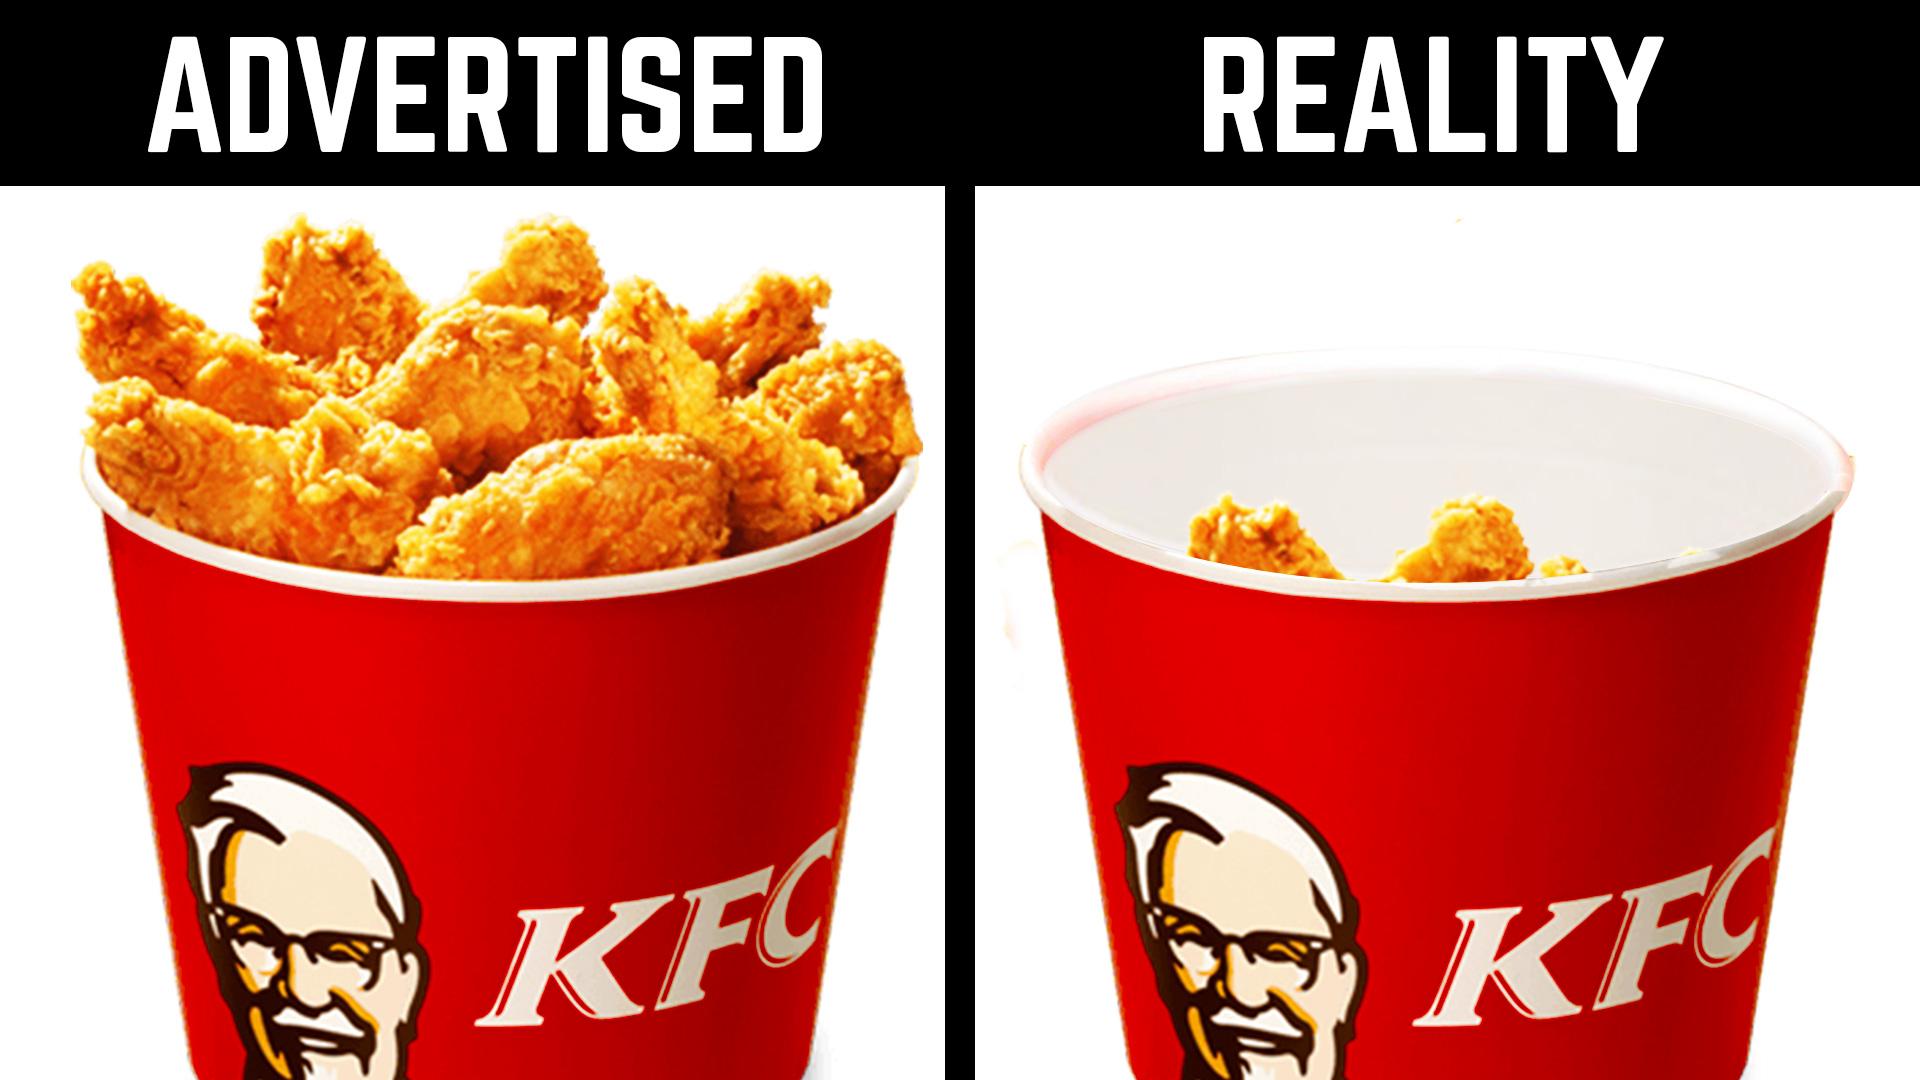 fast food cheated customers